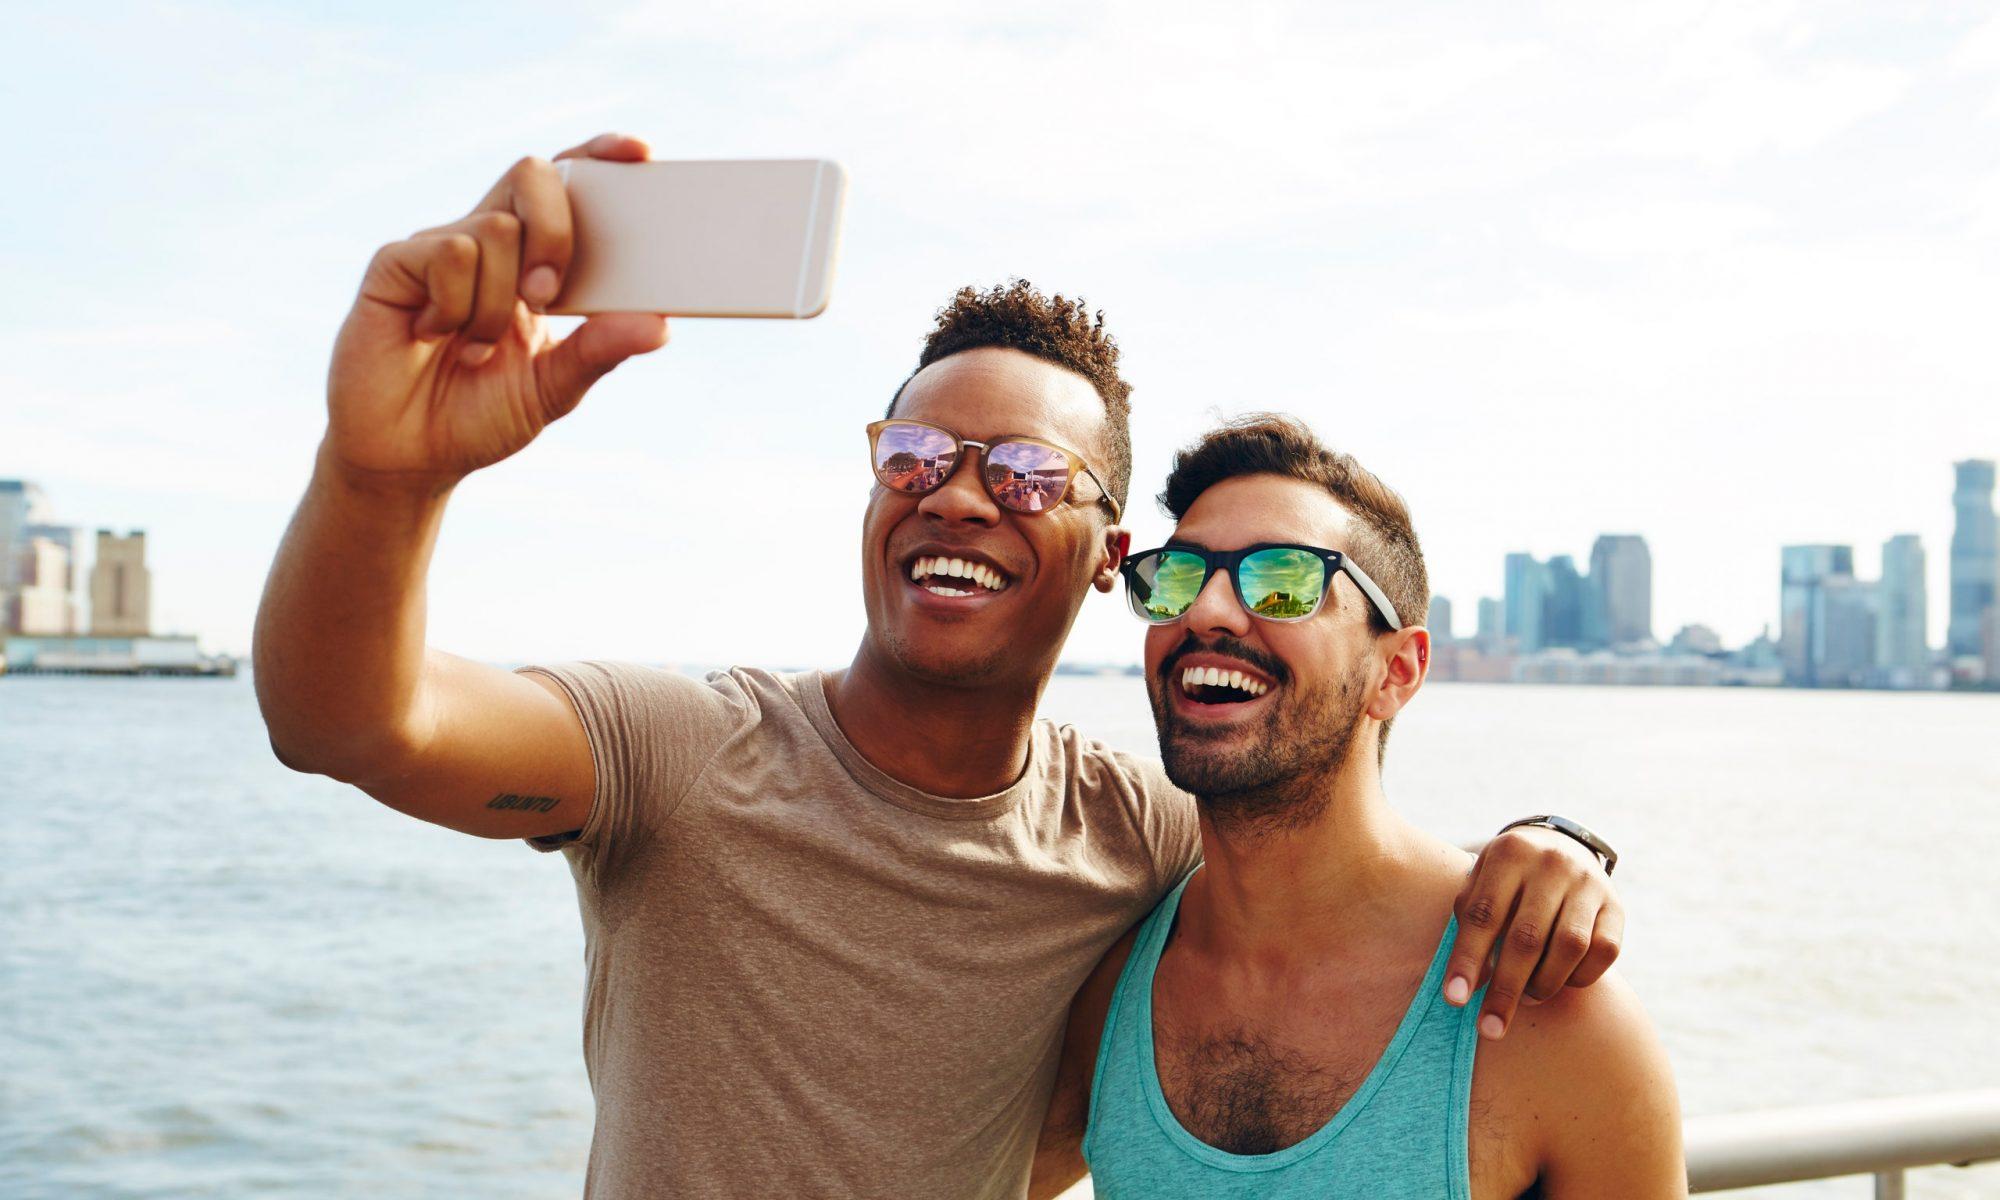 Gay phone dating meet